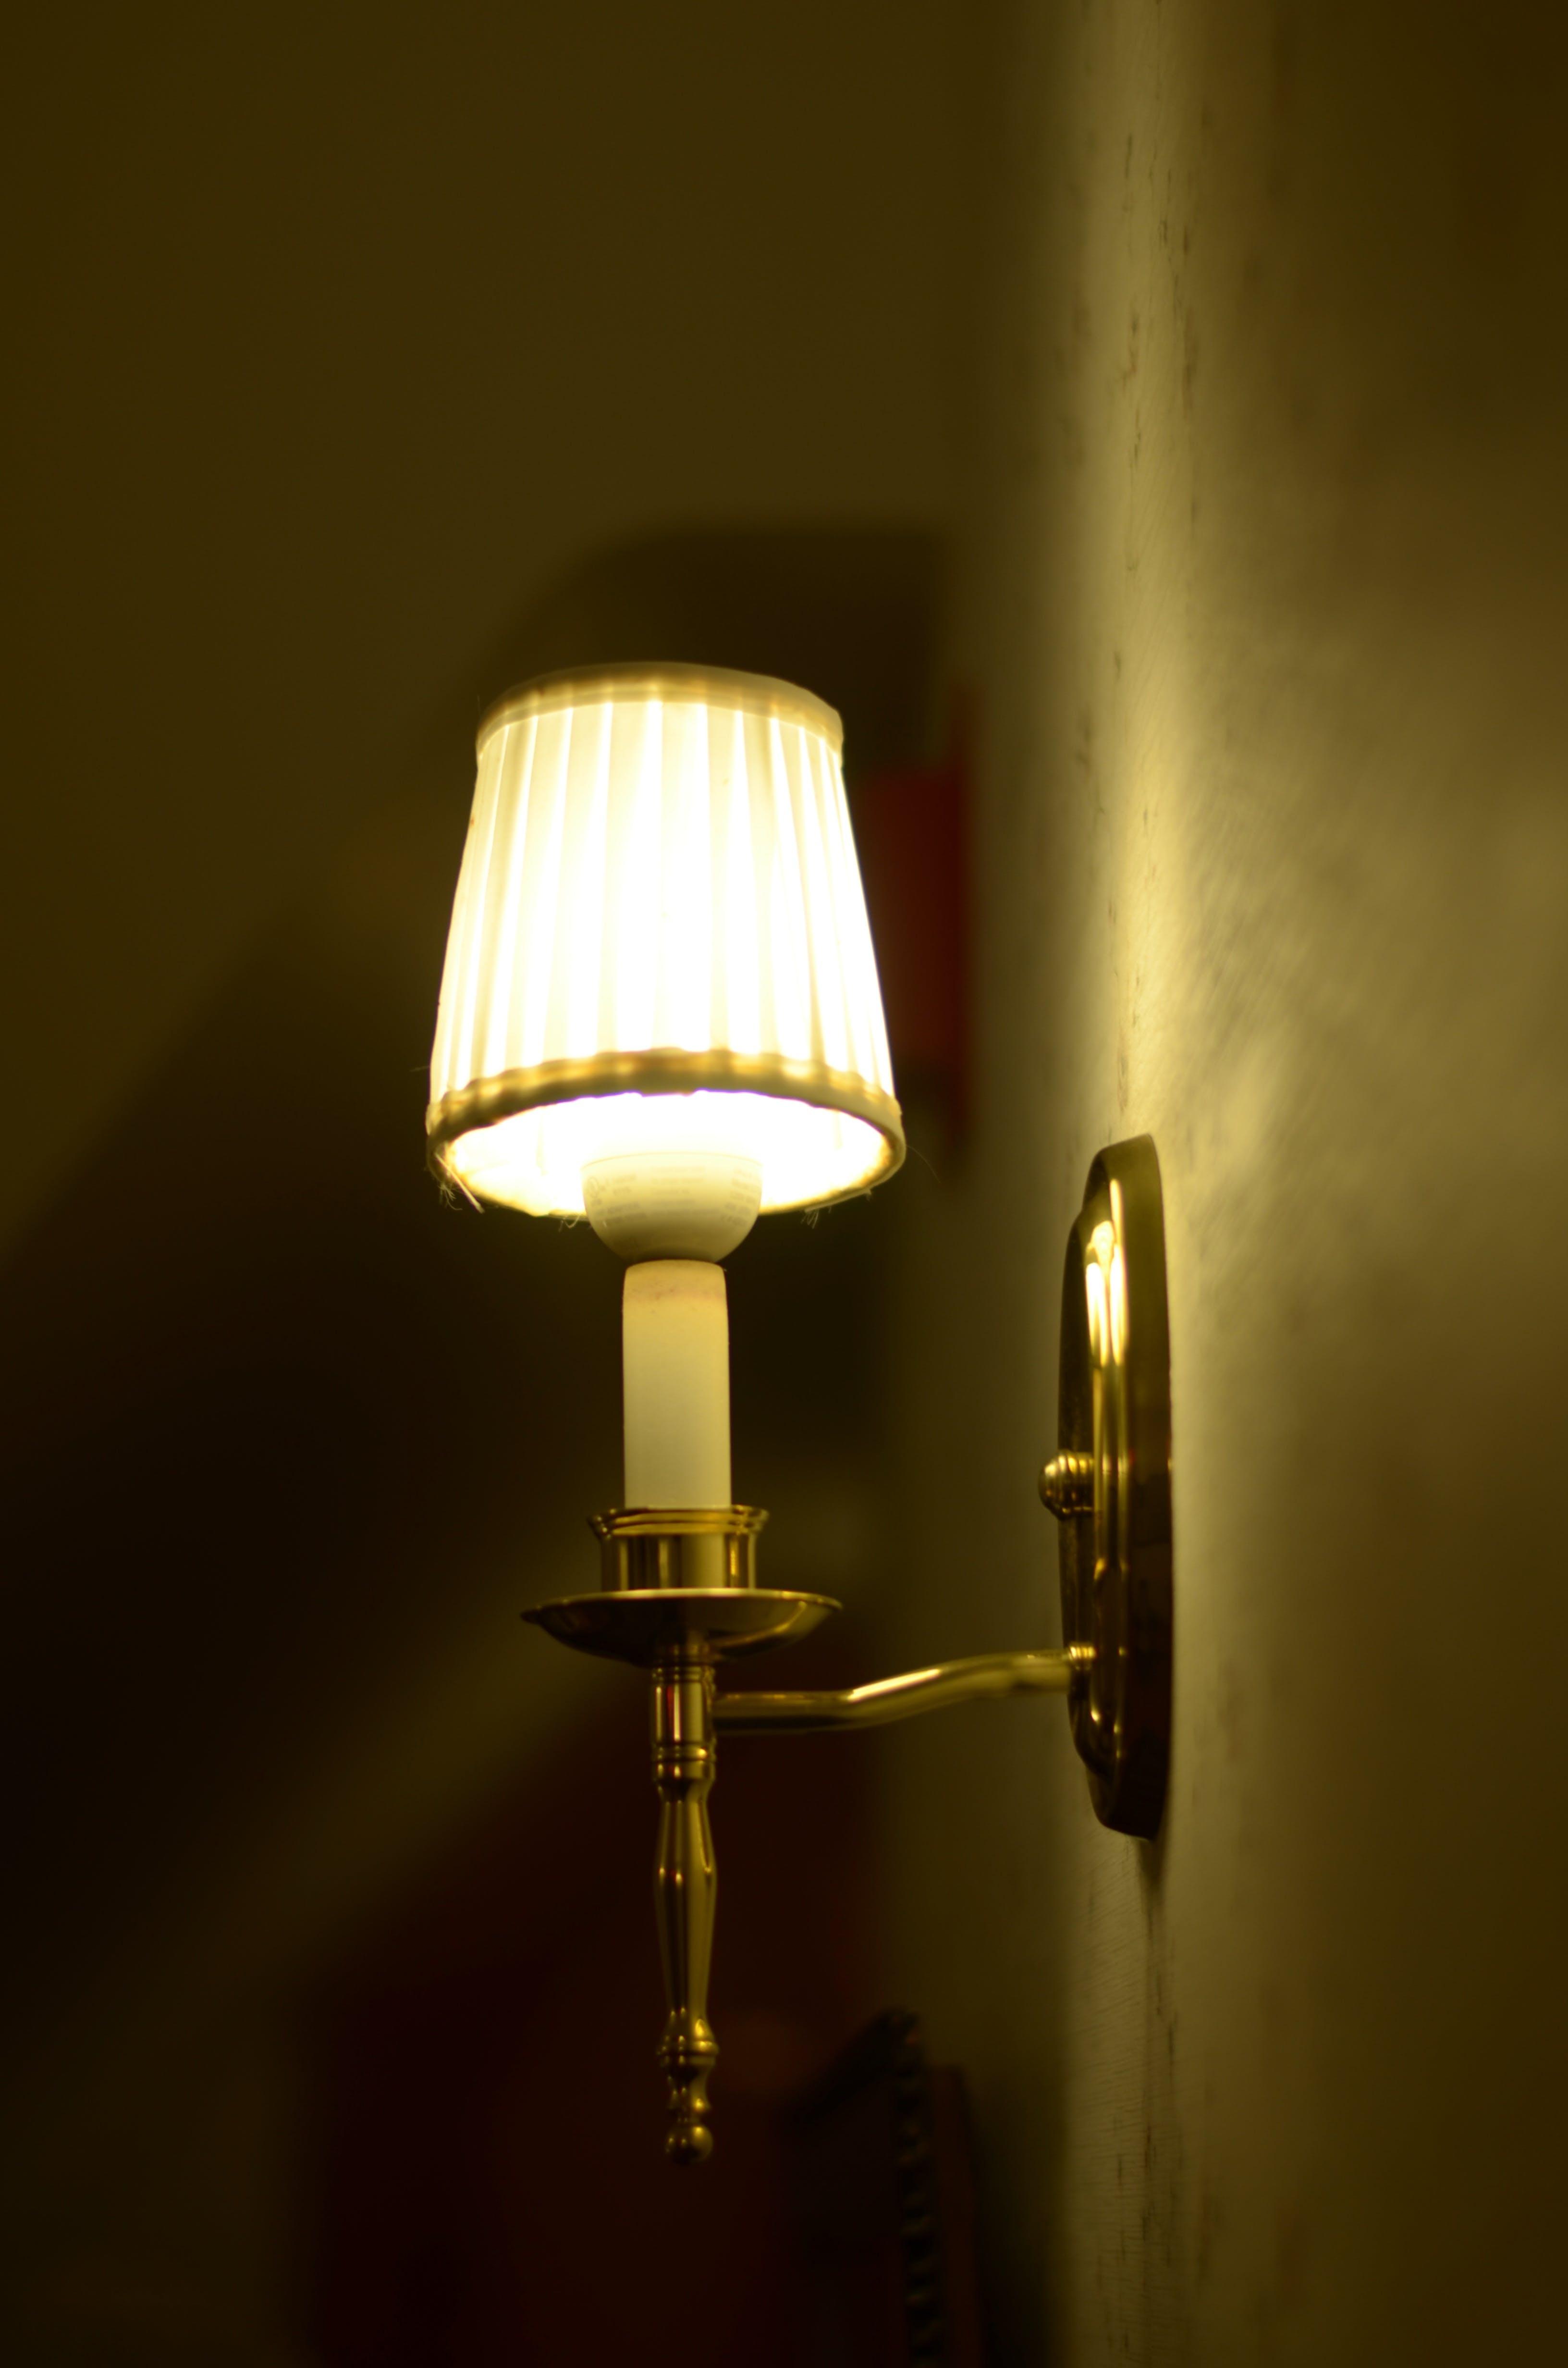 Free stock photo of lamp, idea, dreamy